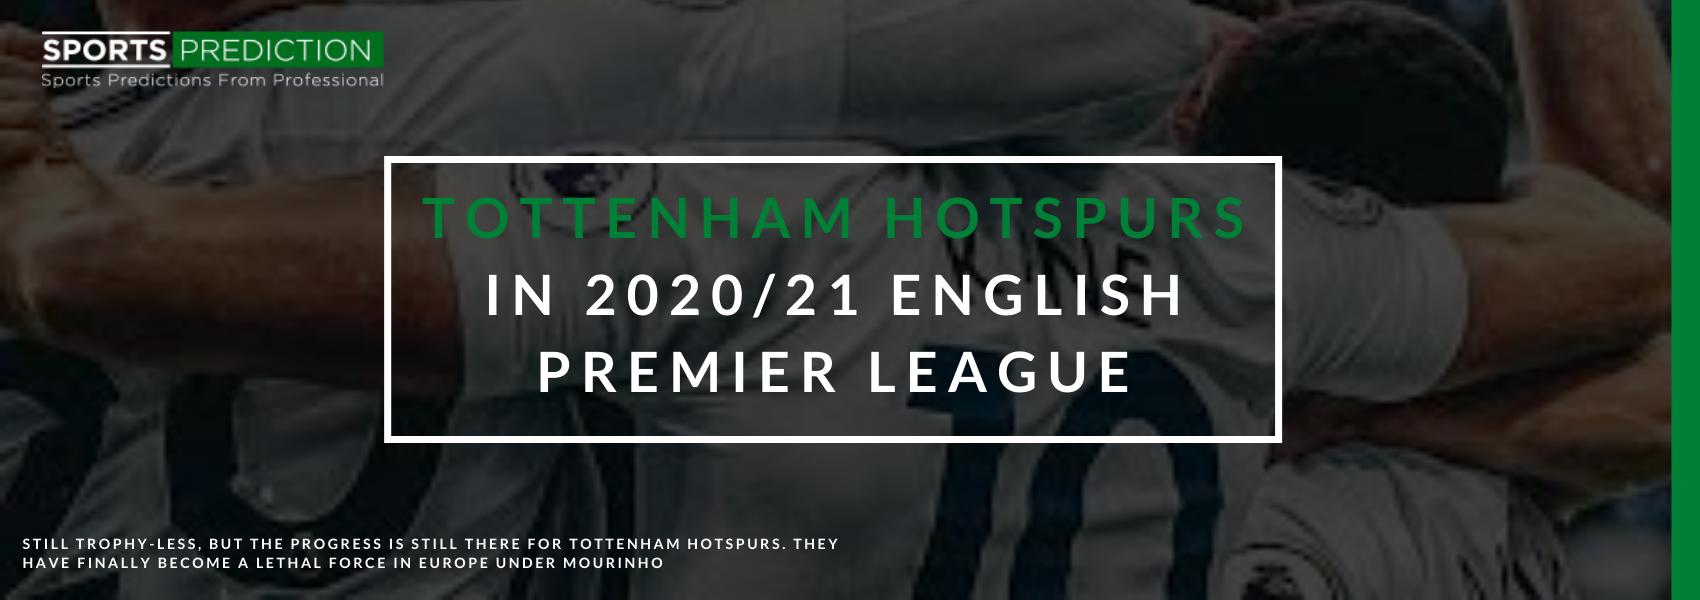 Tottenham Hotspurs In 2020/21 English Premier League